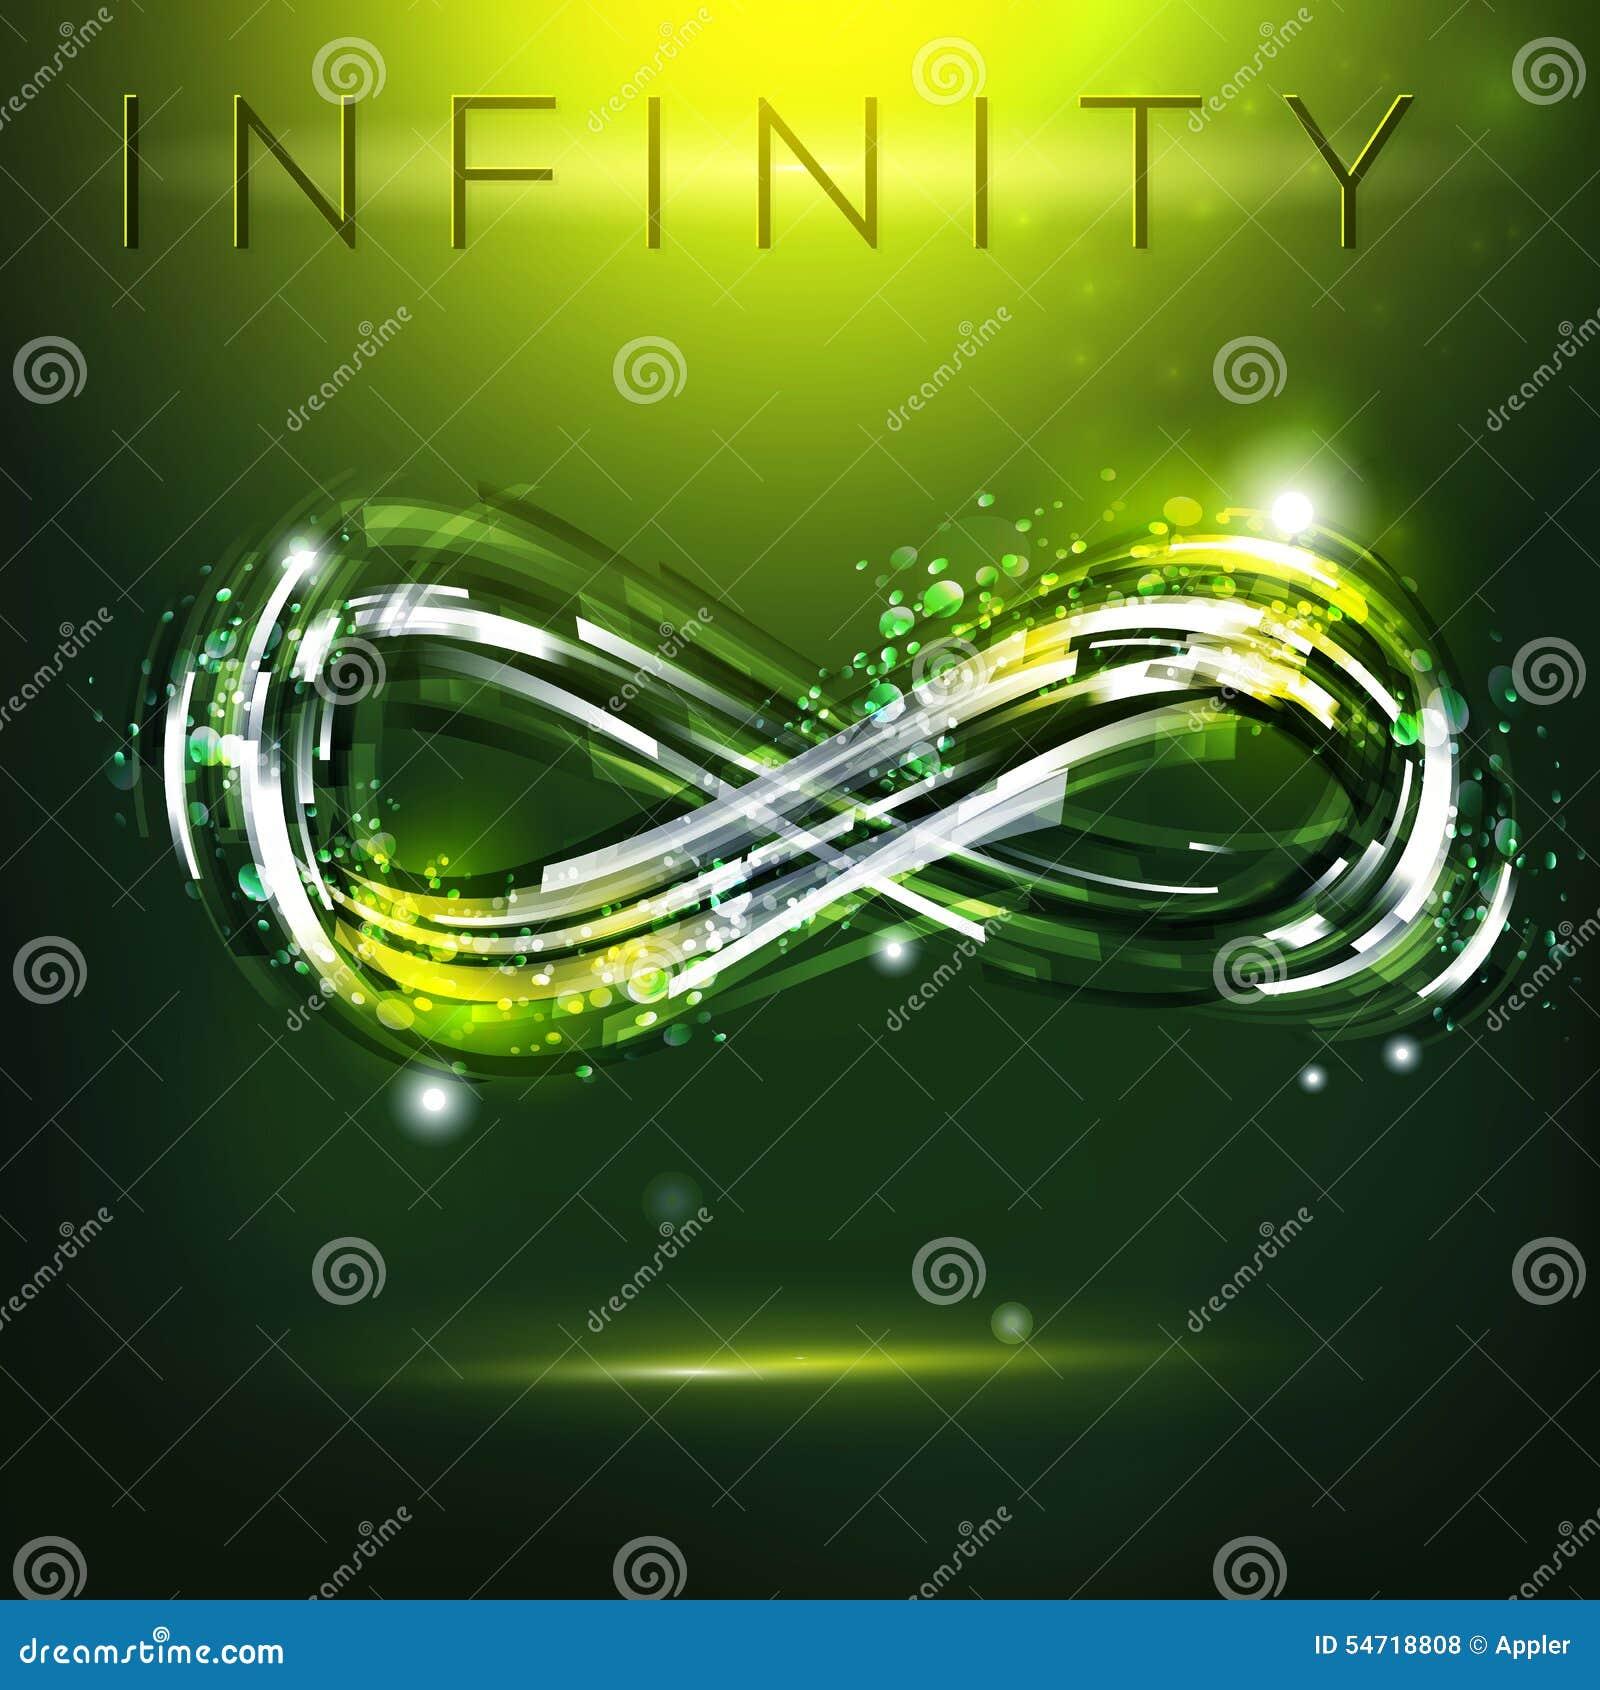 infinity symbol at dark green background stock vector